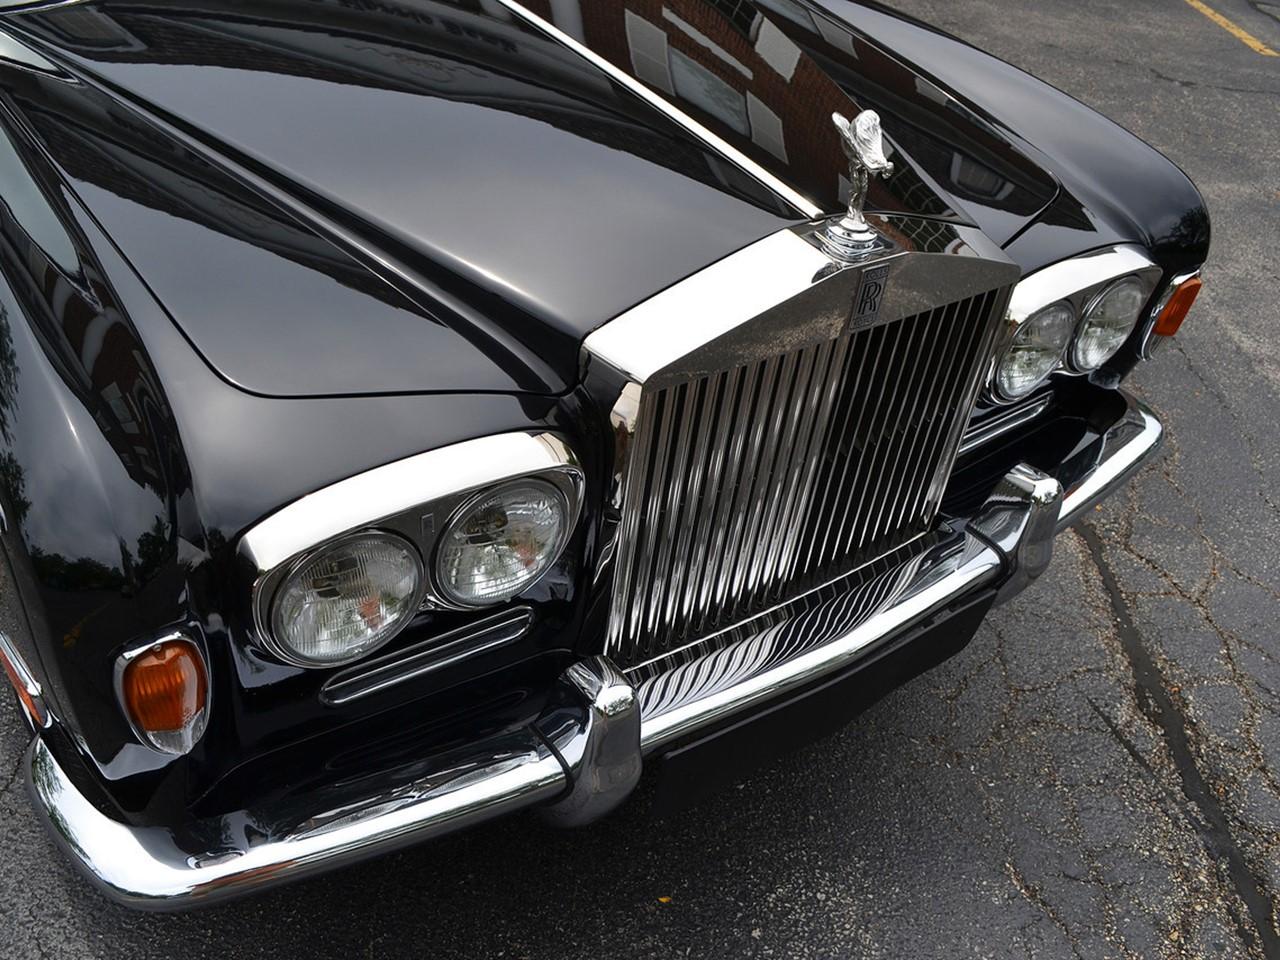 1971 rolls royce silver shadow lwb formal limousine notoriousluxury. Black Bedroom Furniture Sets. Home Design Ideas